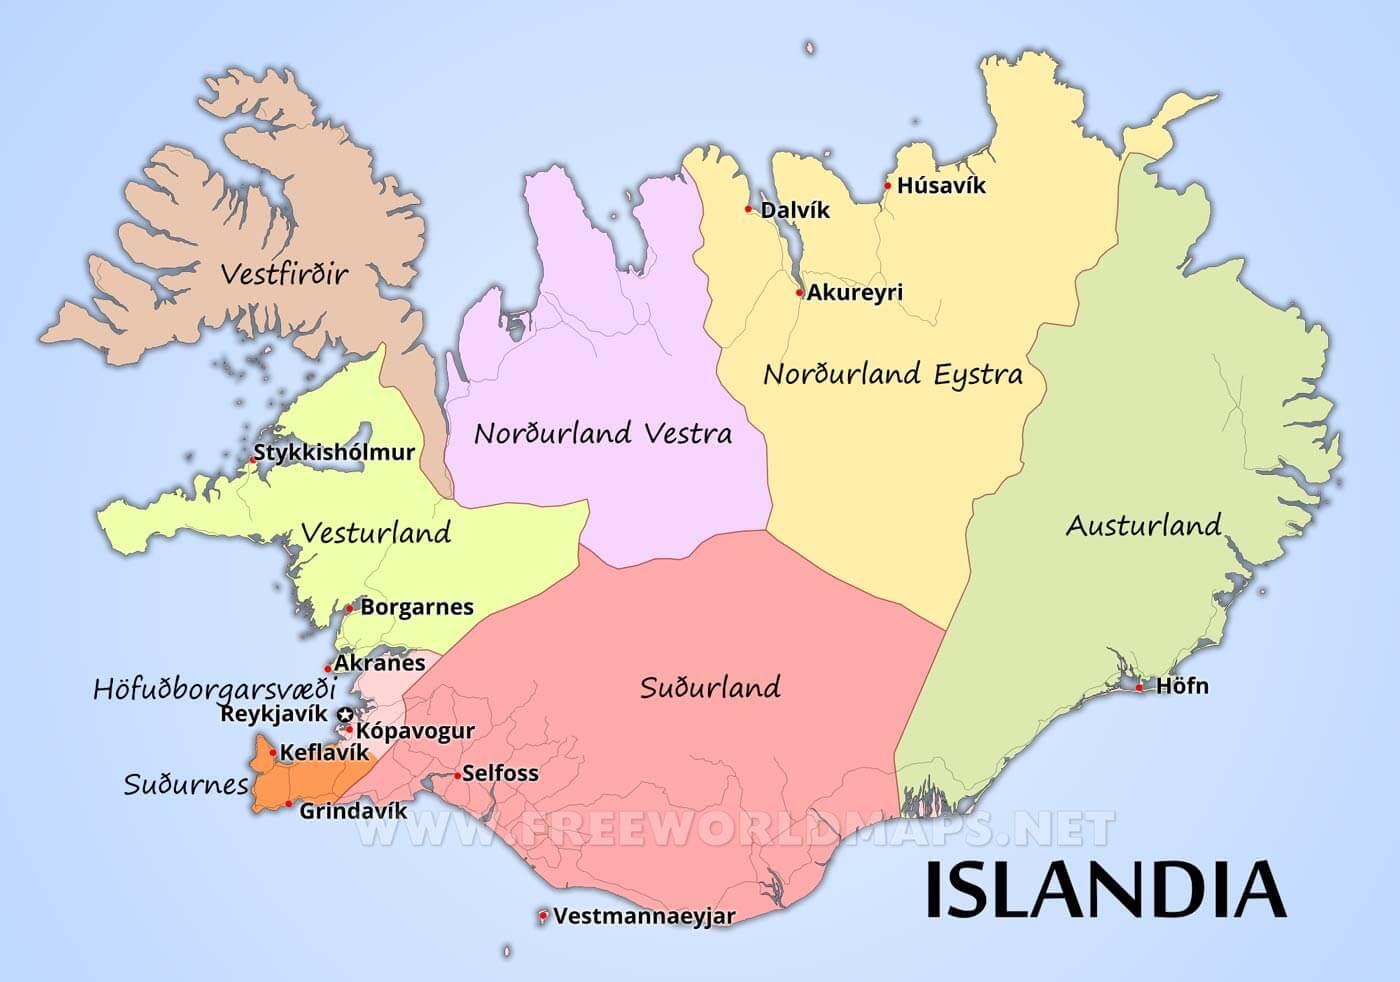 islandia mapa Mapa de Islandia islandia mapa